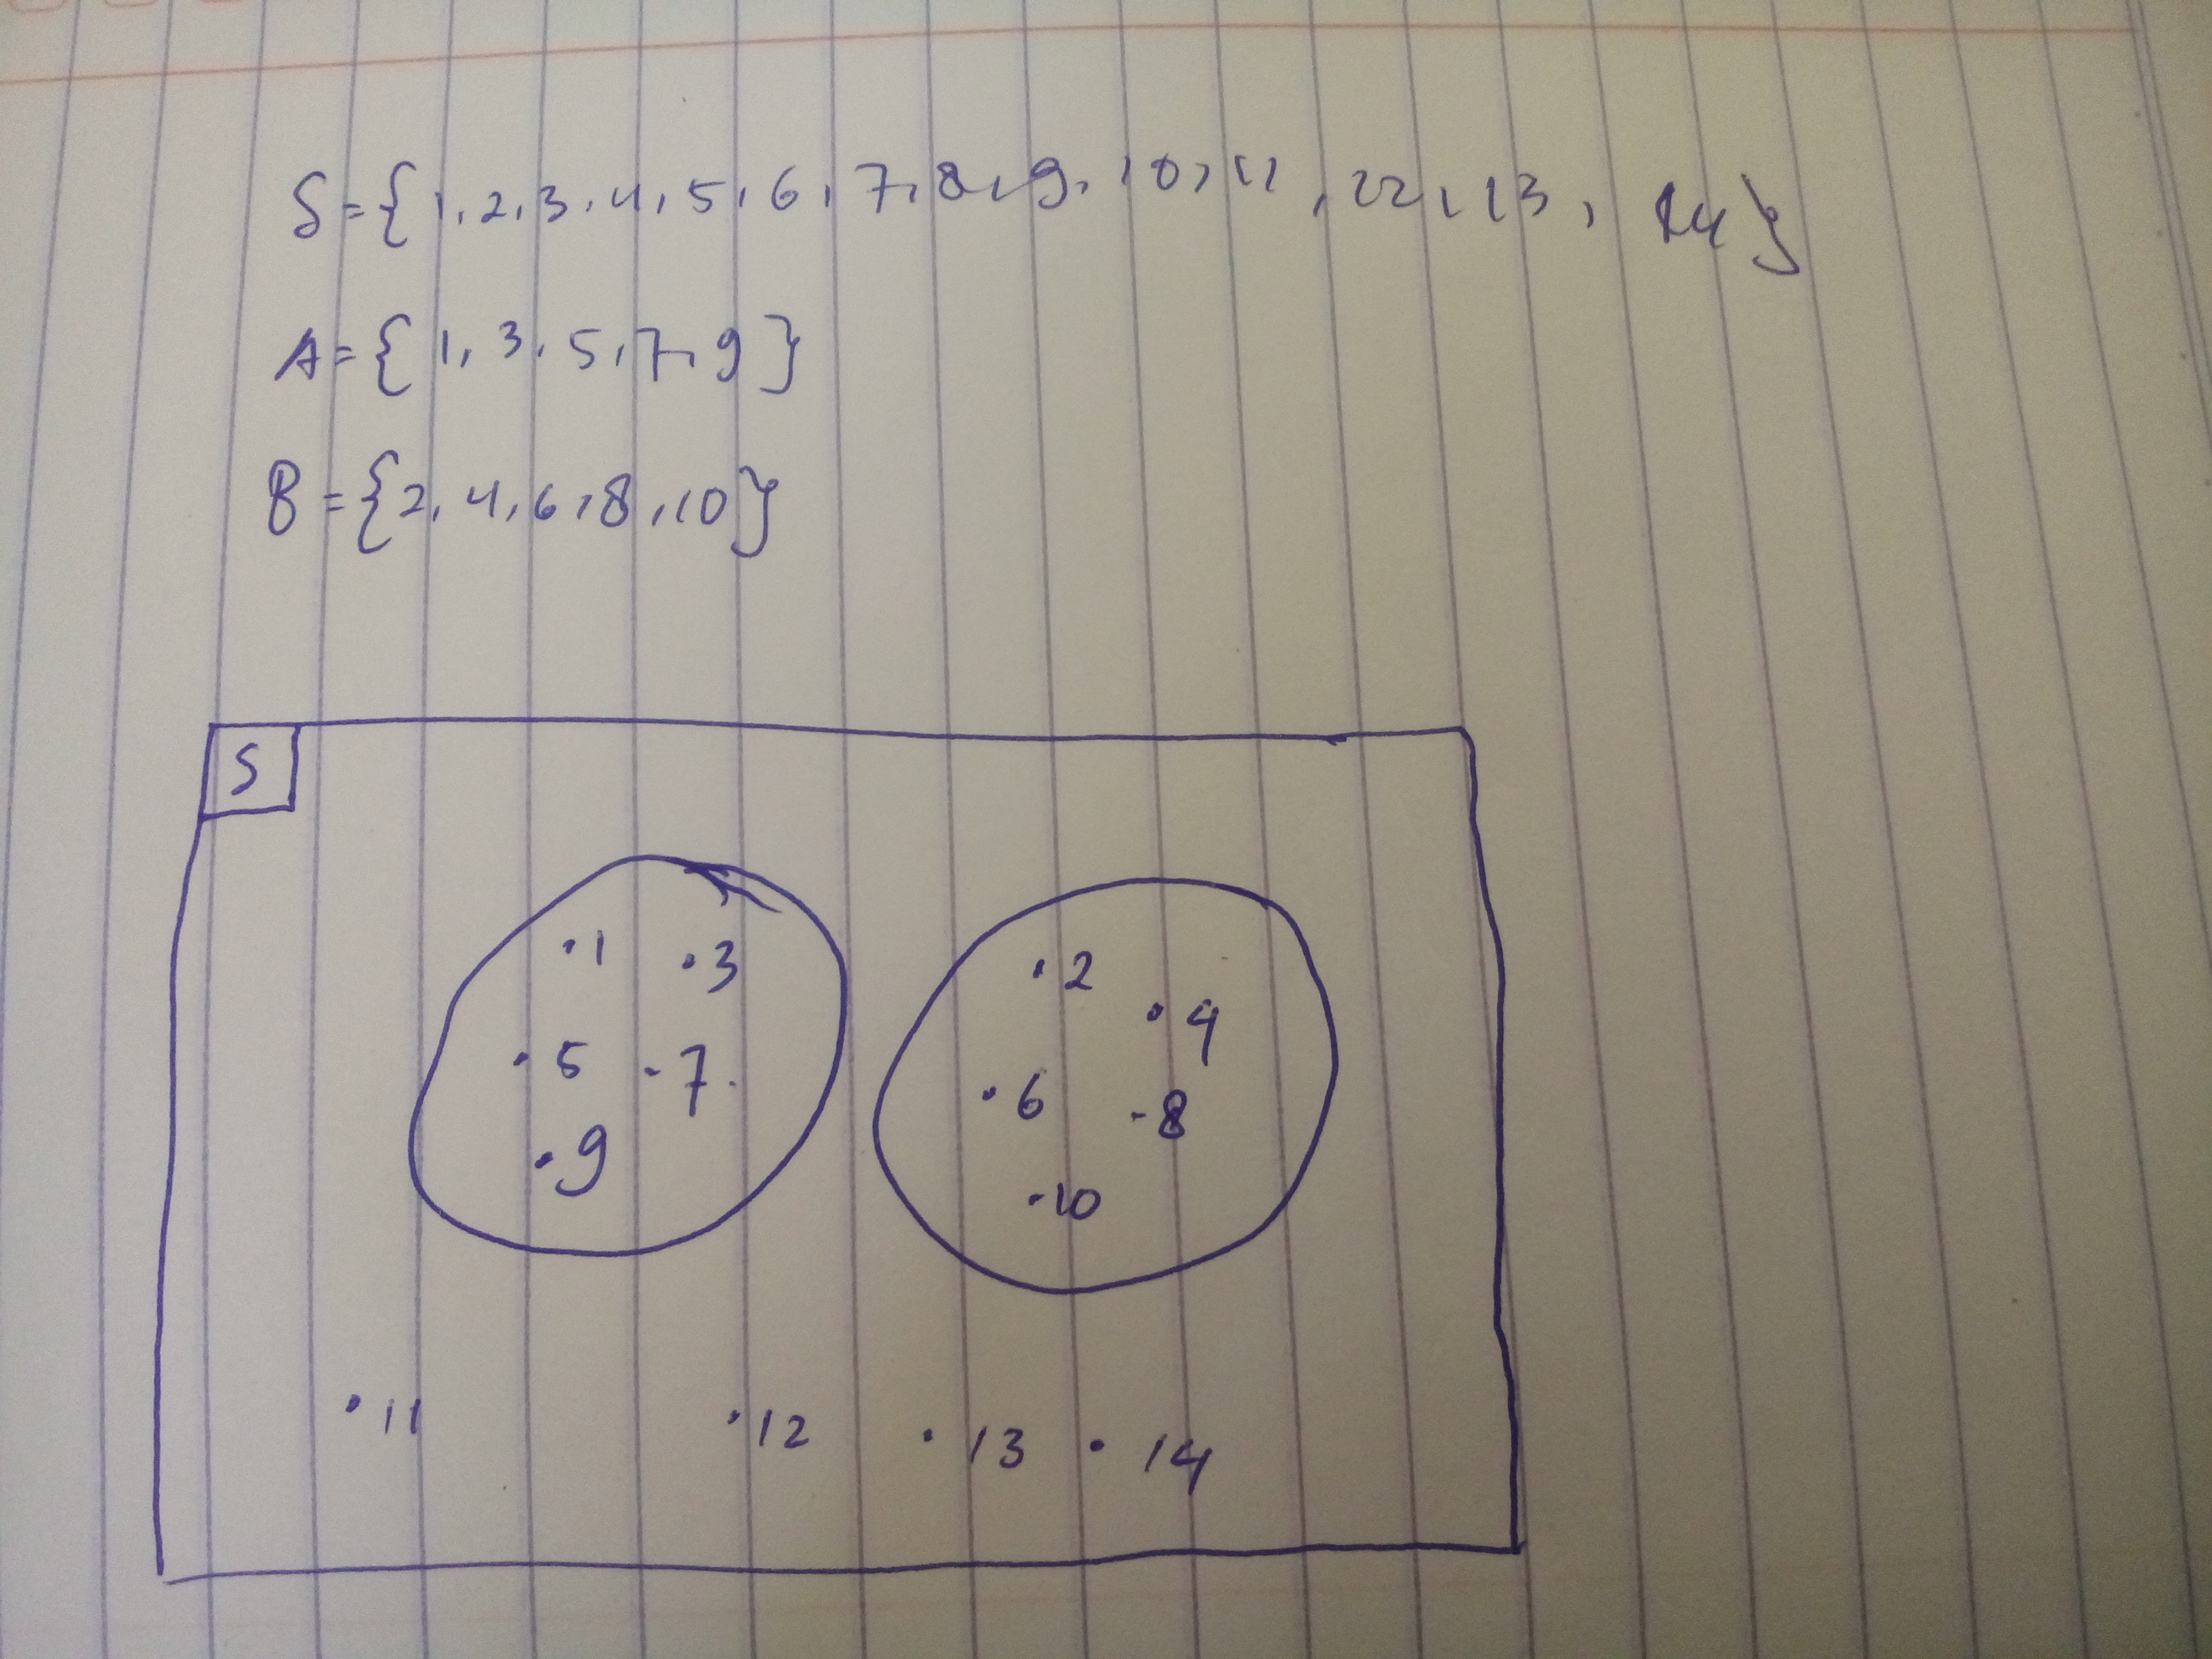 Diagram venn untuk 3 himpunan smartdraw diagrams gambarlah diagram venn untuk himpunan berikut a s 1 ccuart Gallery